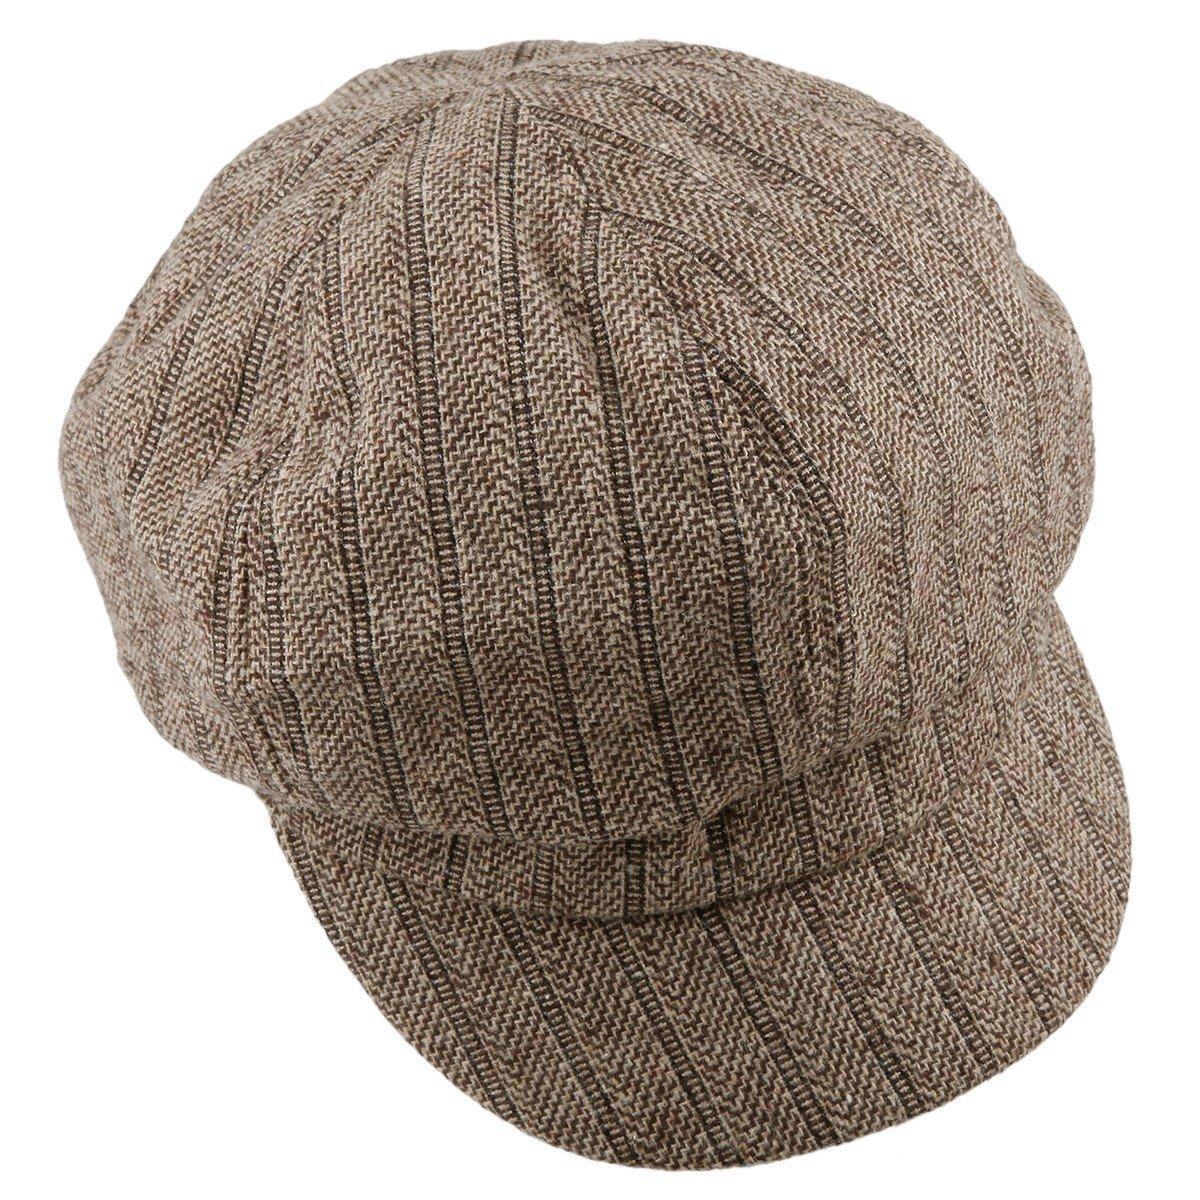 Moonsix Newsboys Hats,Unisex Winter Berets Hat Woolen Cotton Cabbie Cap 0